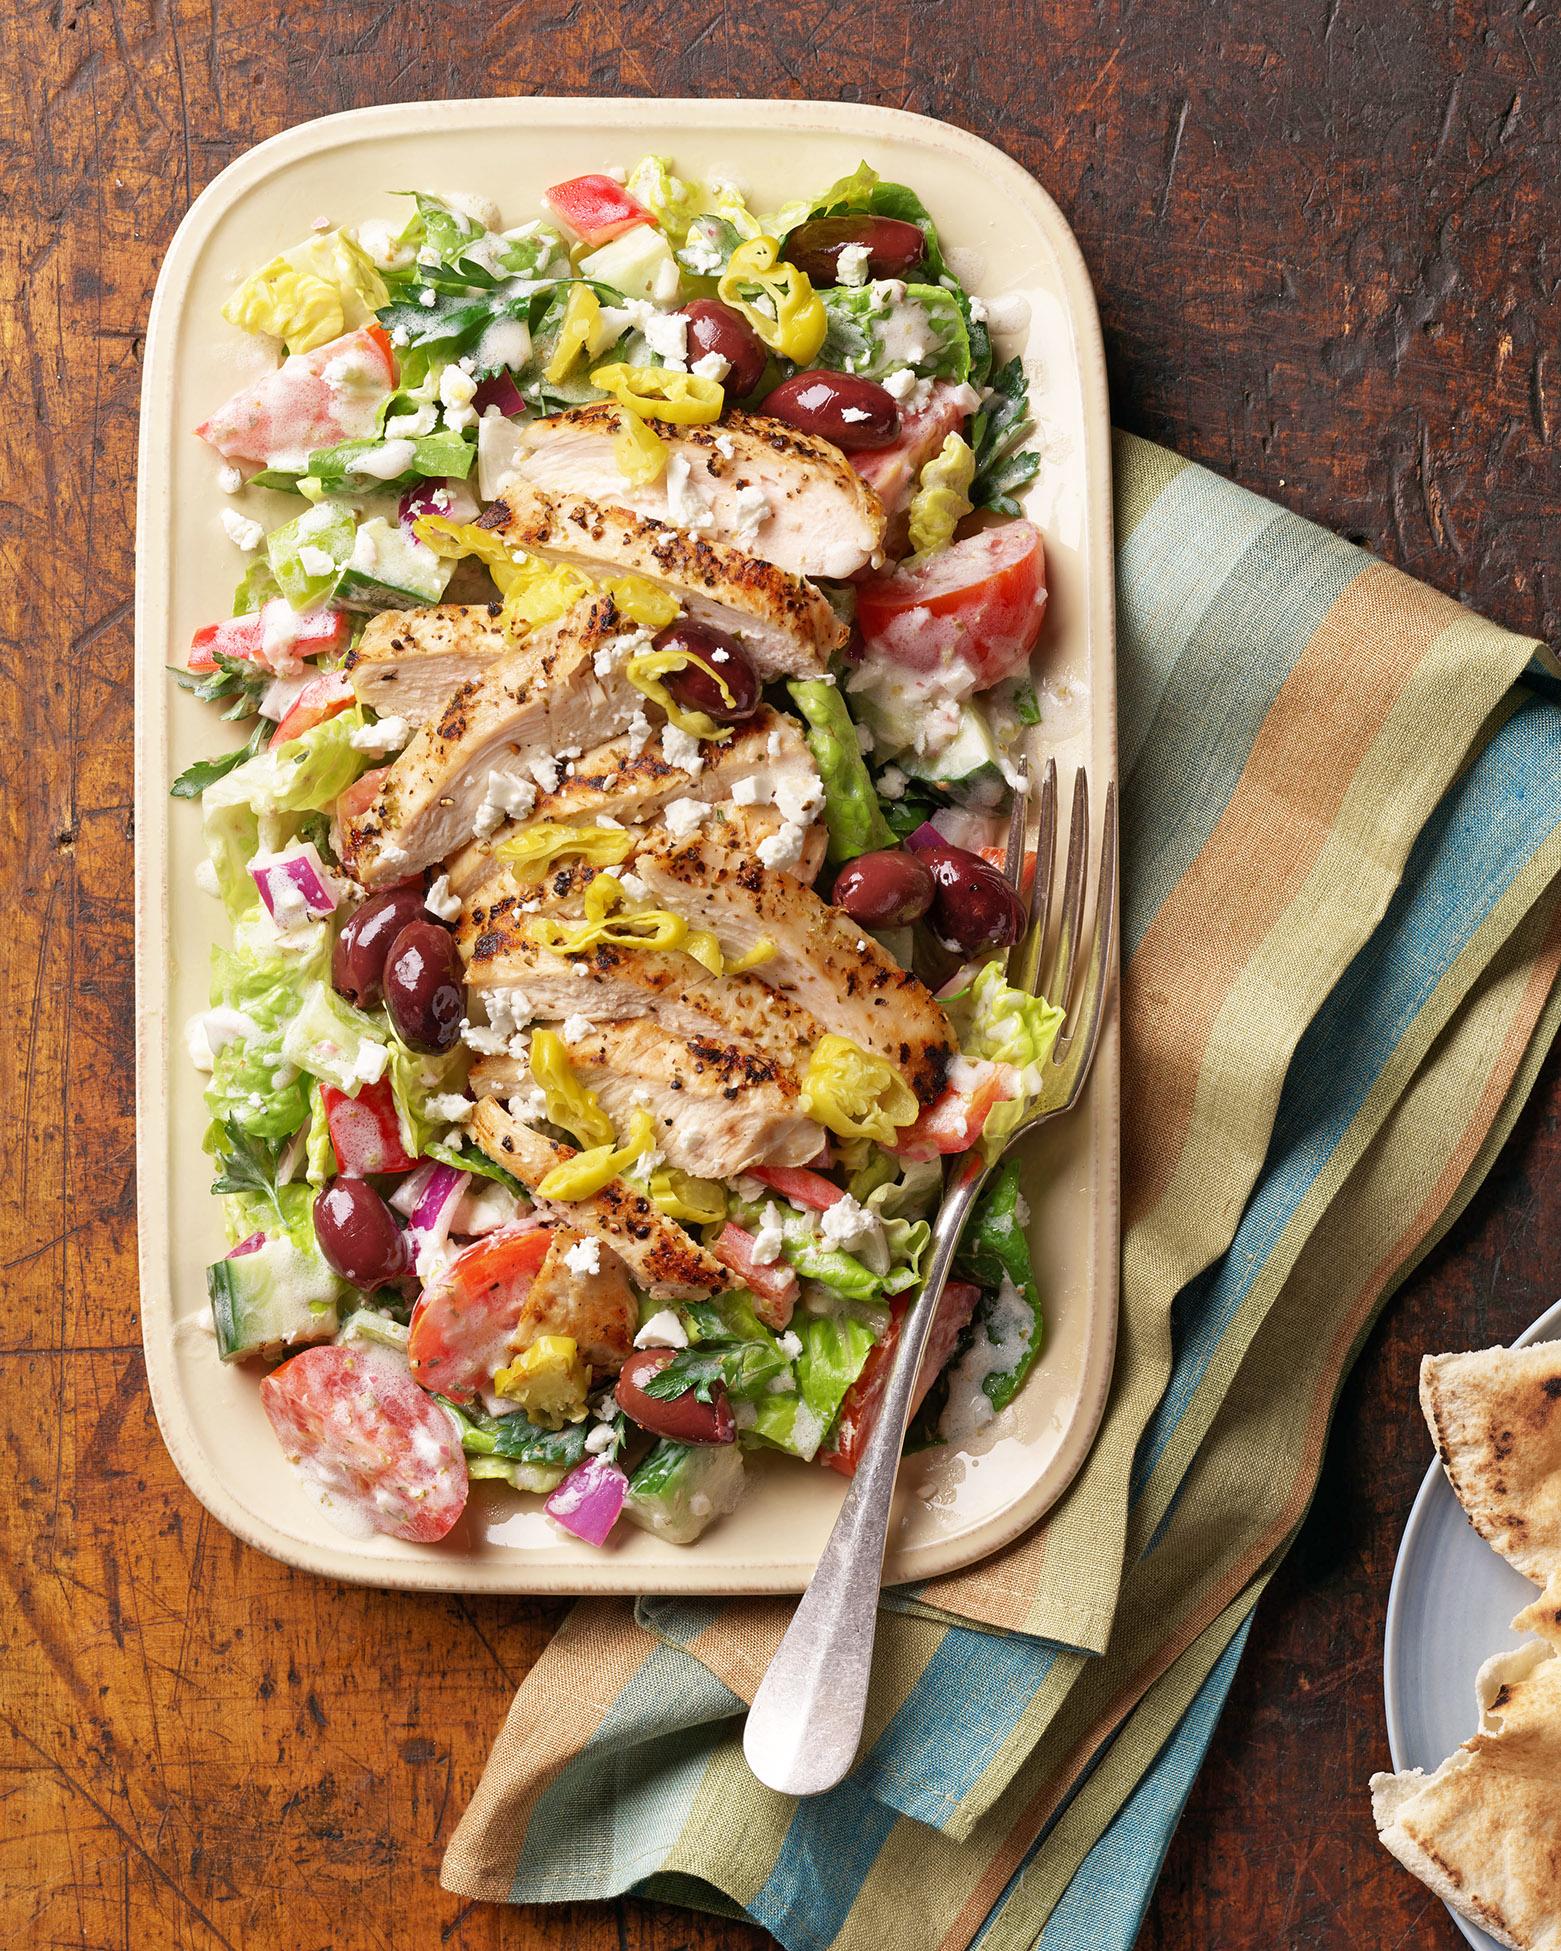 go-greek grilled-chicken salad with creamy dressing